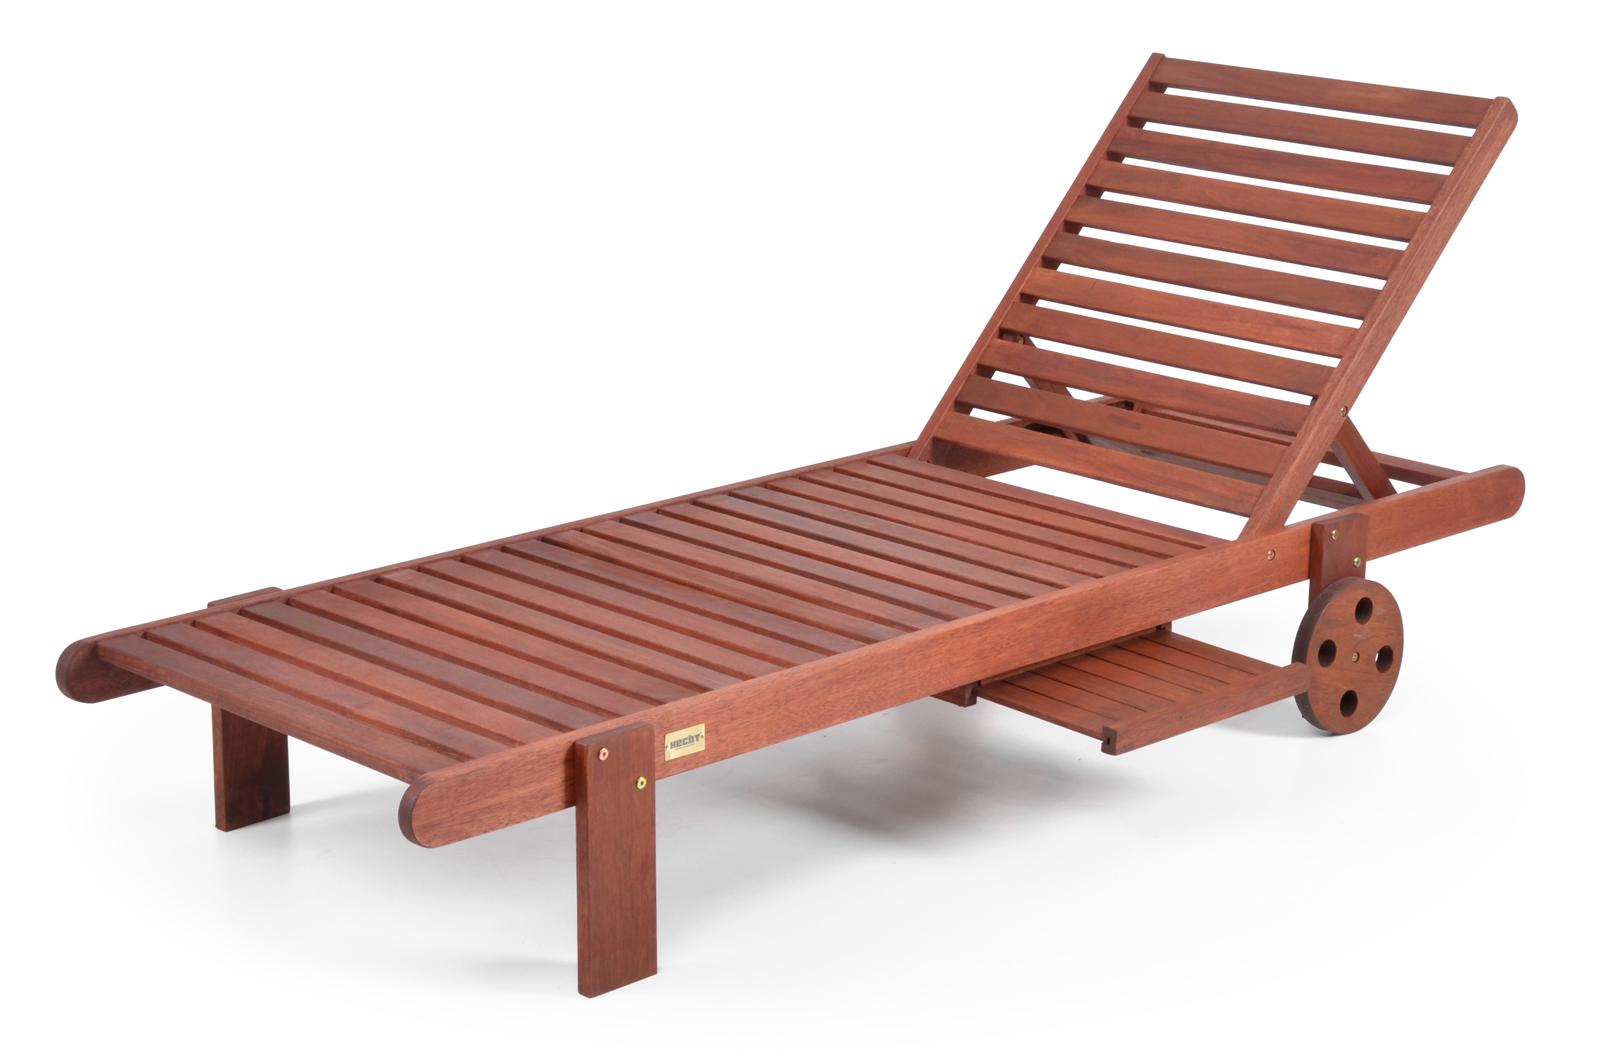 Záhradné lehátko - Hecht - Resort I (meranti)